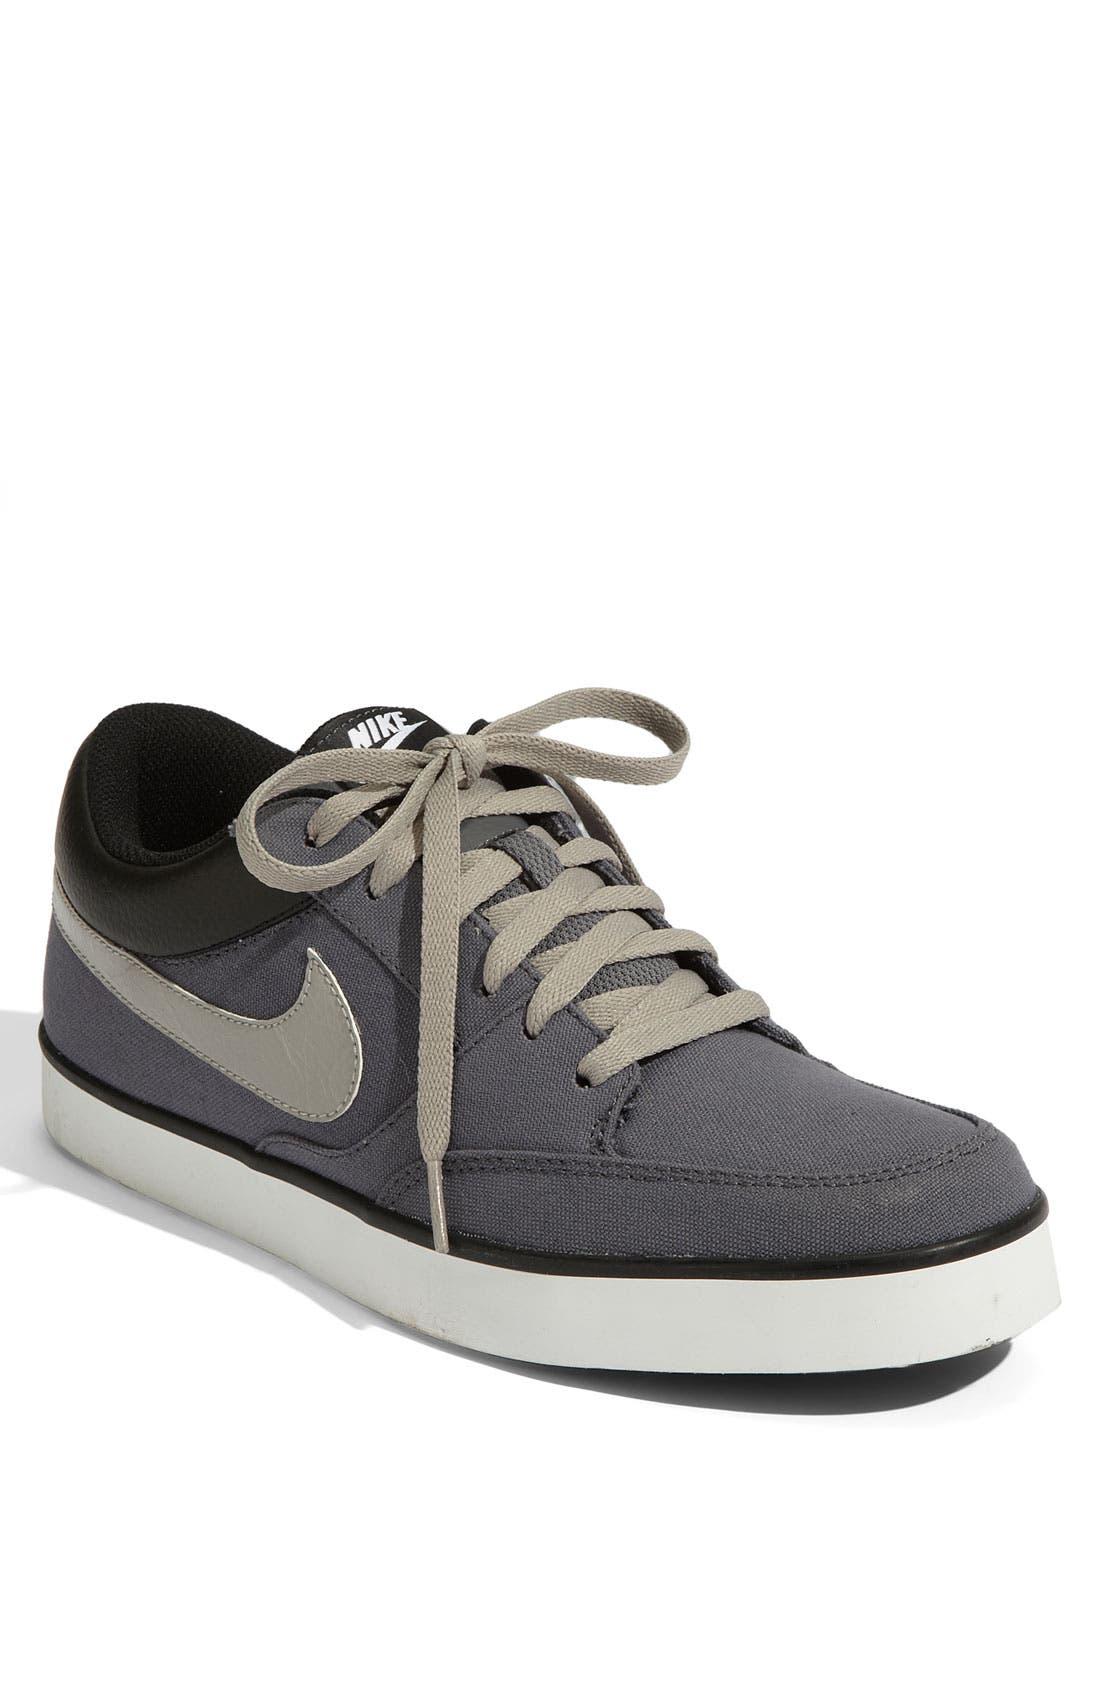 NIKE,                             'Avid' Sneaker,                             Main thumbnail 1, color,                             002